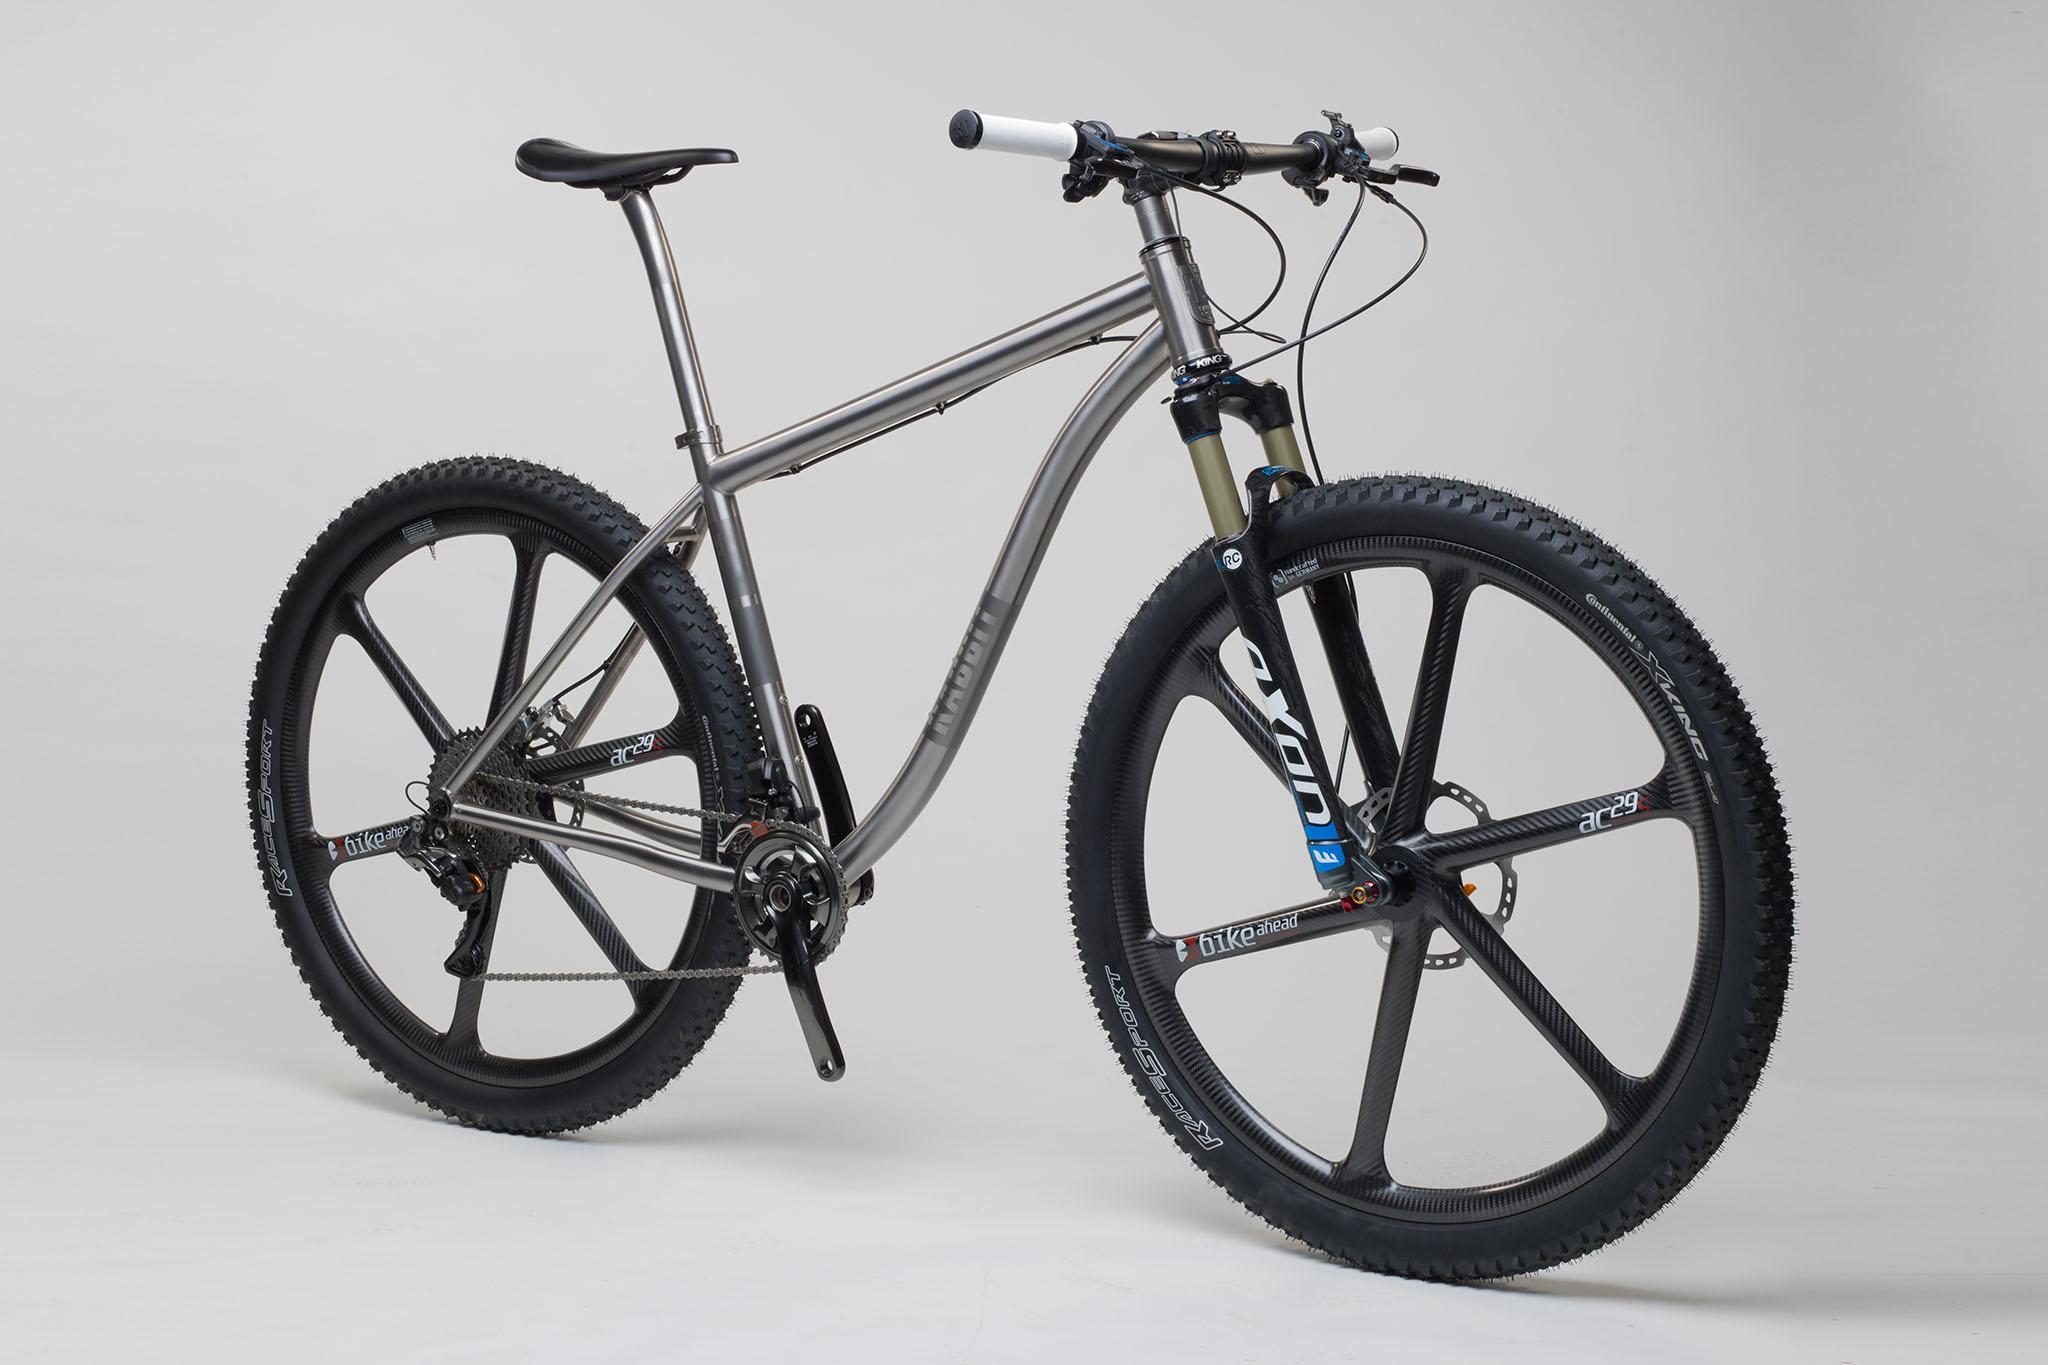 titan_mtb_29_er_24_from_rabbit_titan_cycles_bavaria